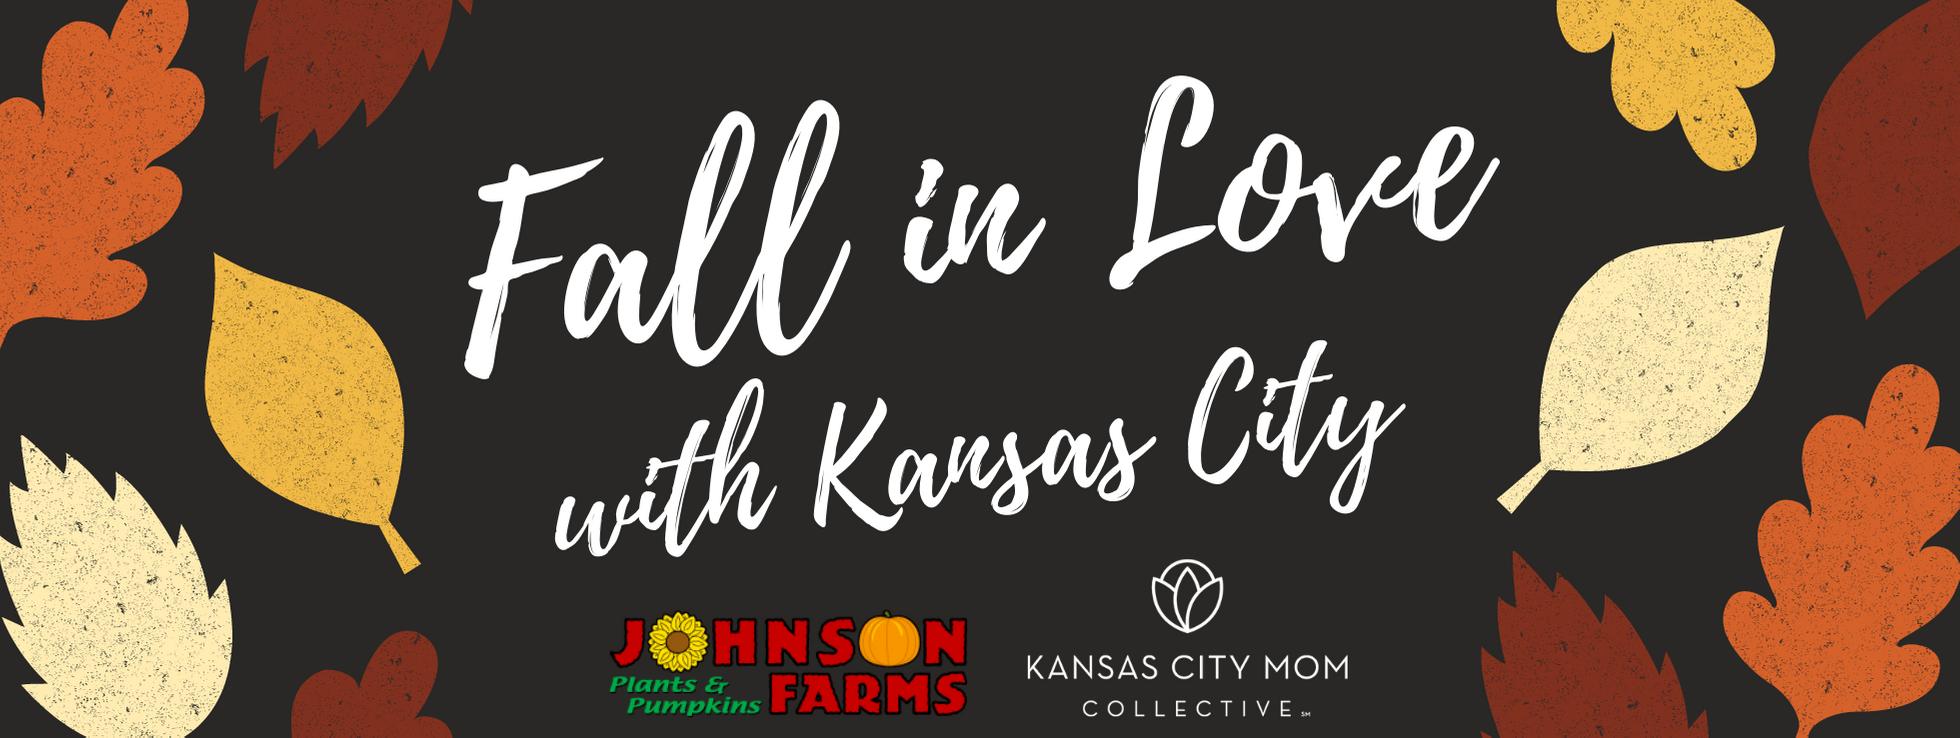 Fall Guide Kansas City 2020